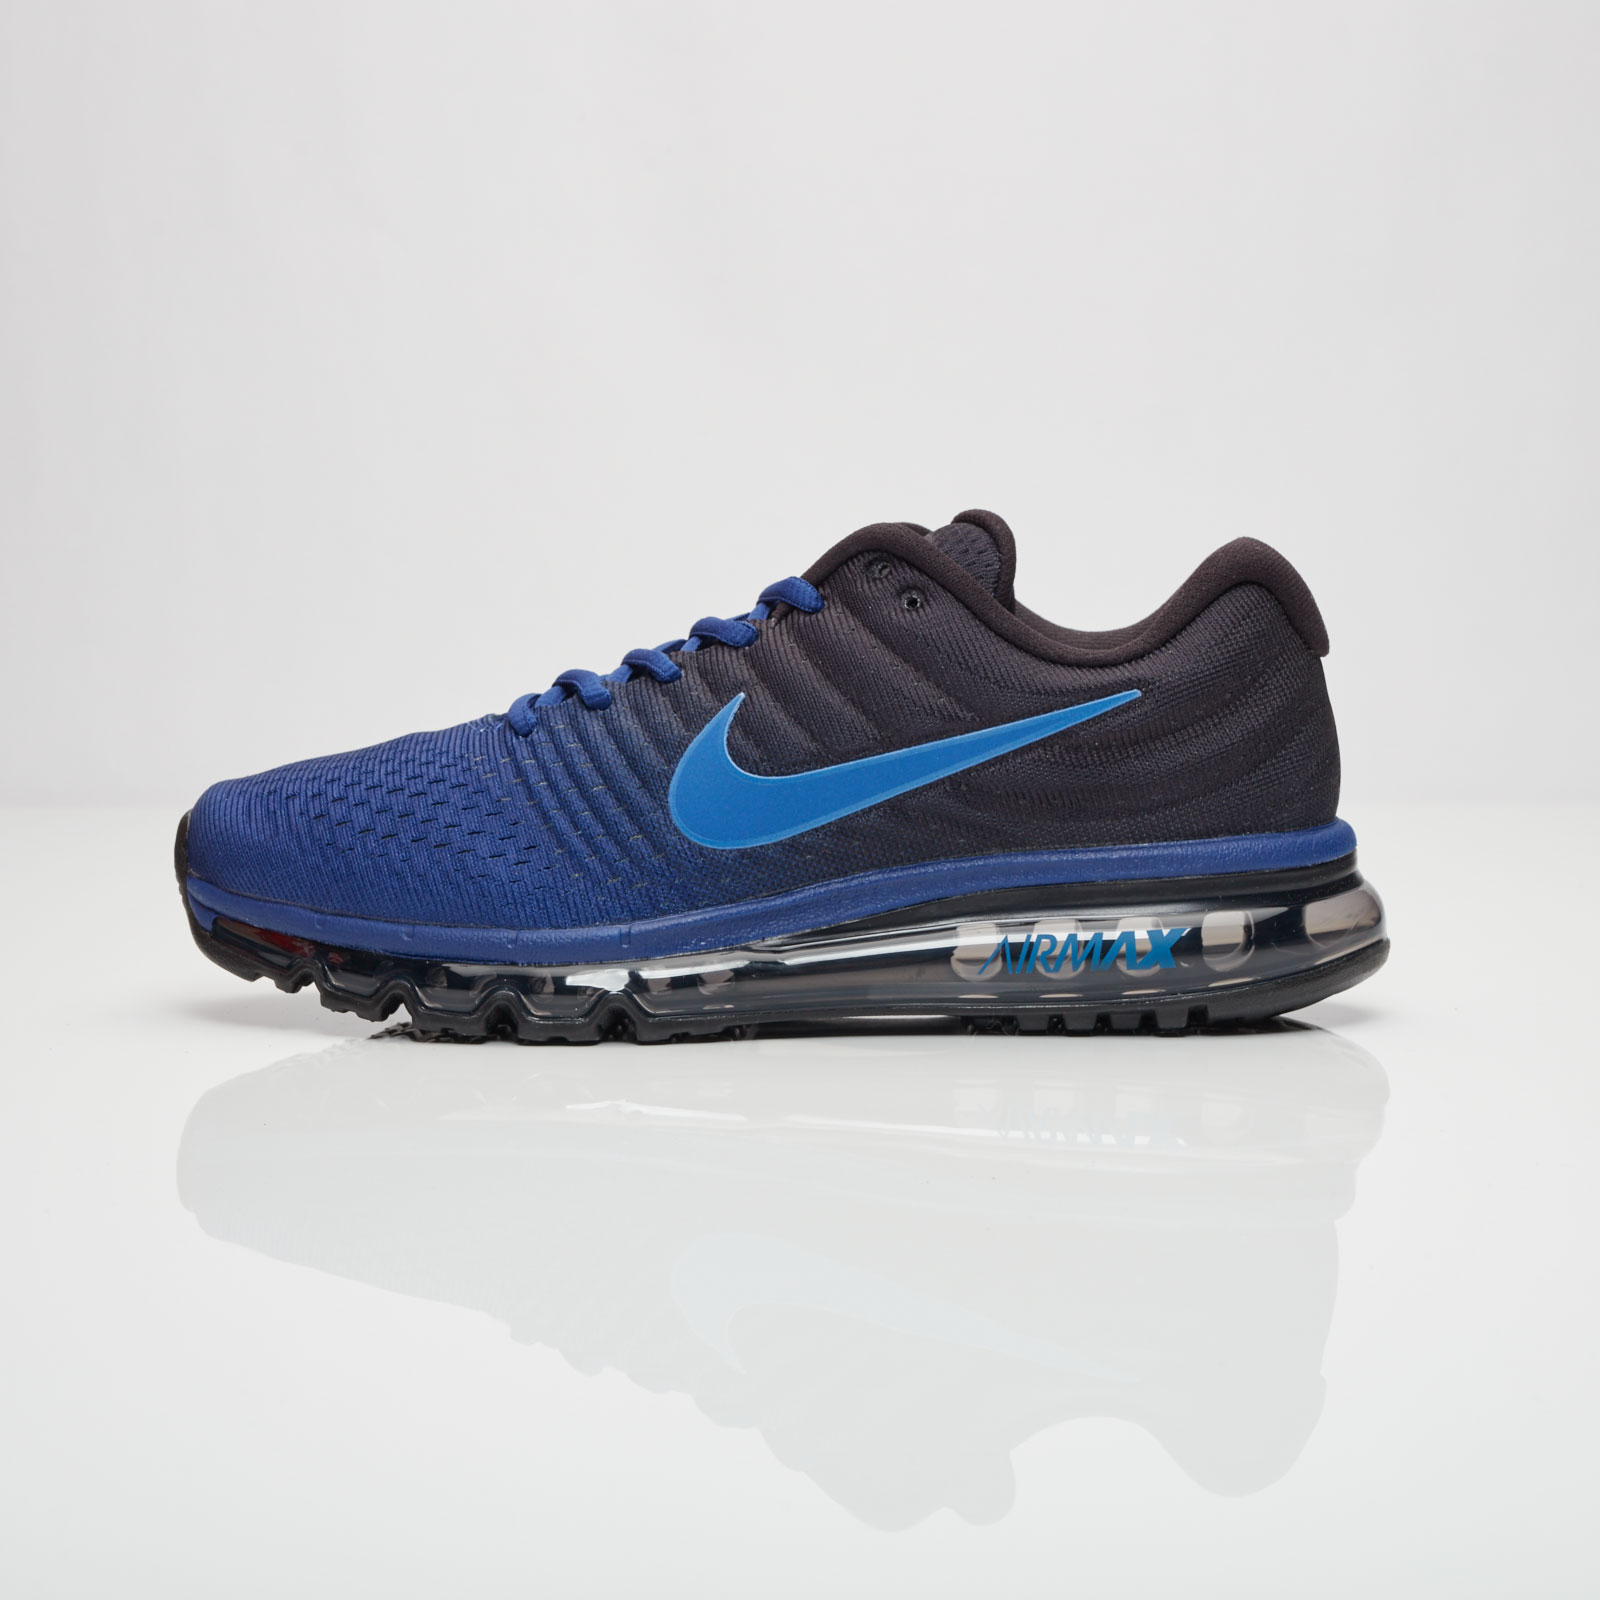 ba06f10563 Nike Air Max 2017 - 849559-401 - Sneakersnstuff | sneakers & streetwear  online since 1999